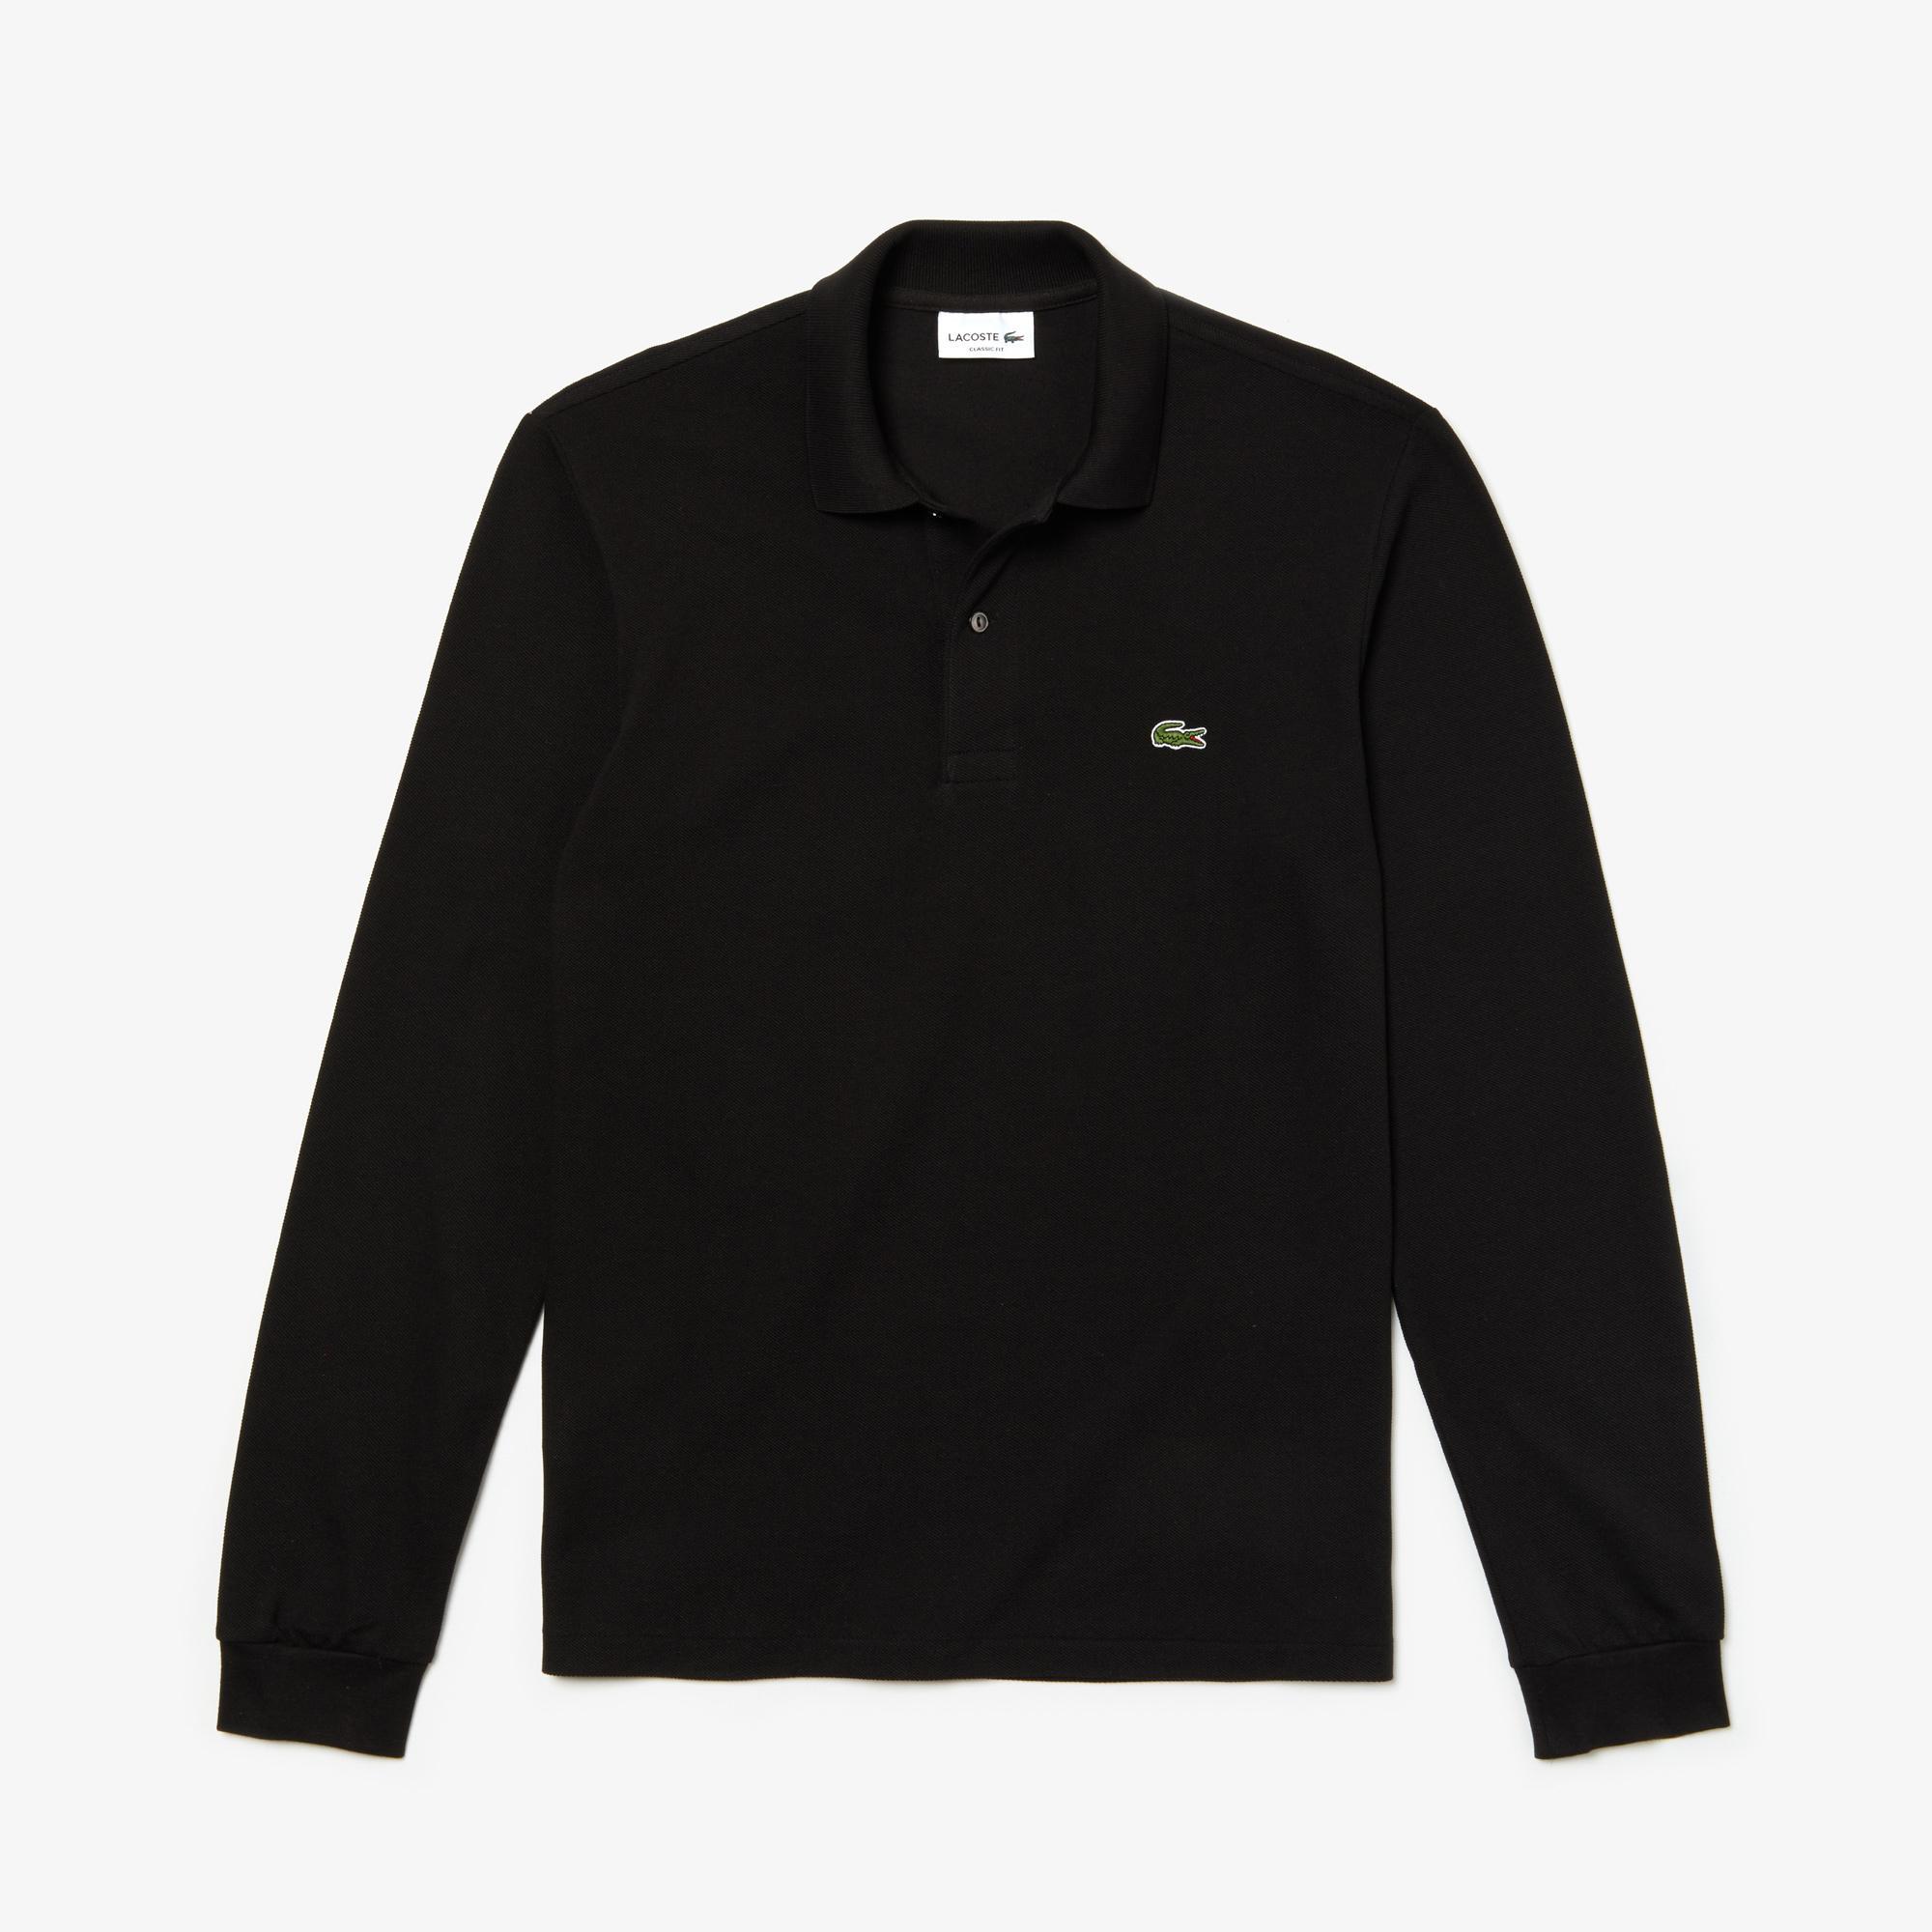 Lacoste Erkek Klasik Fit L1212 Uzun Kollu Siyah Polo